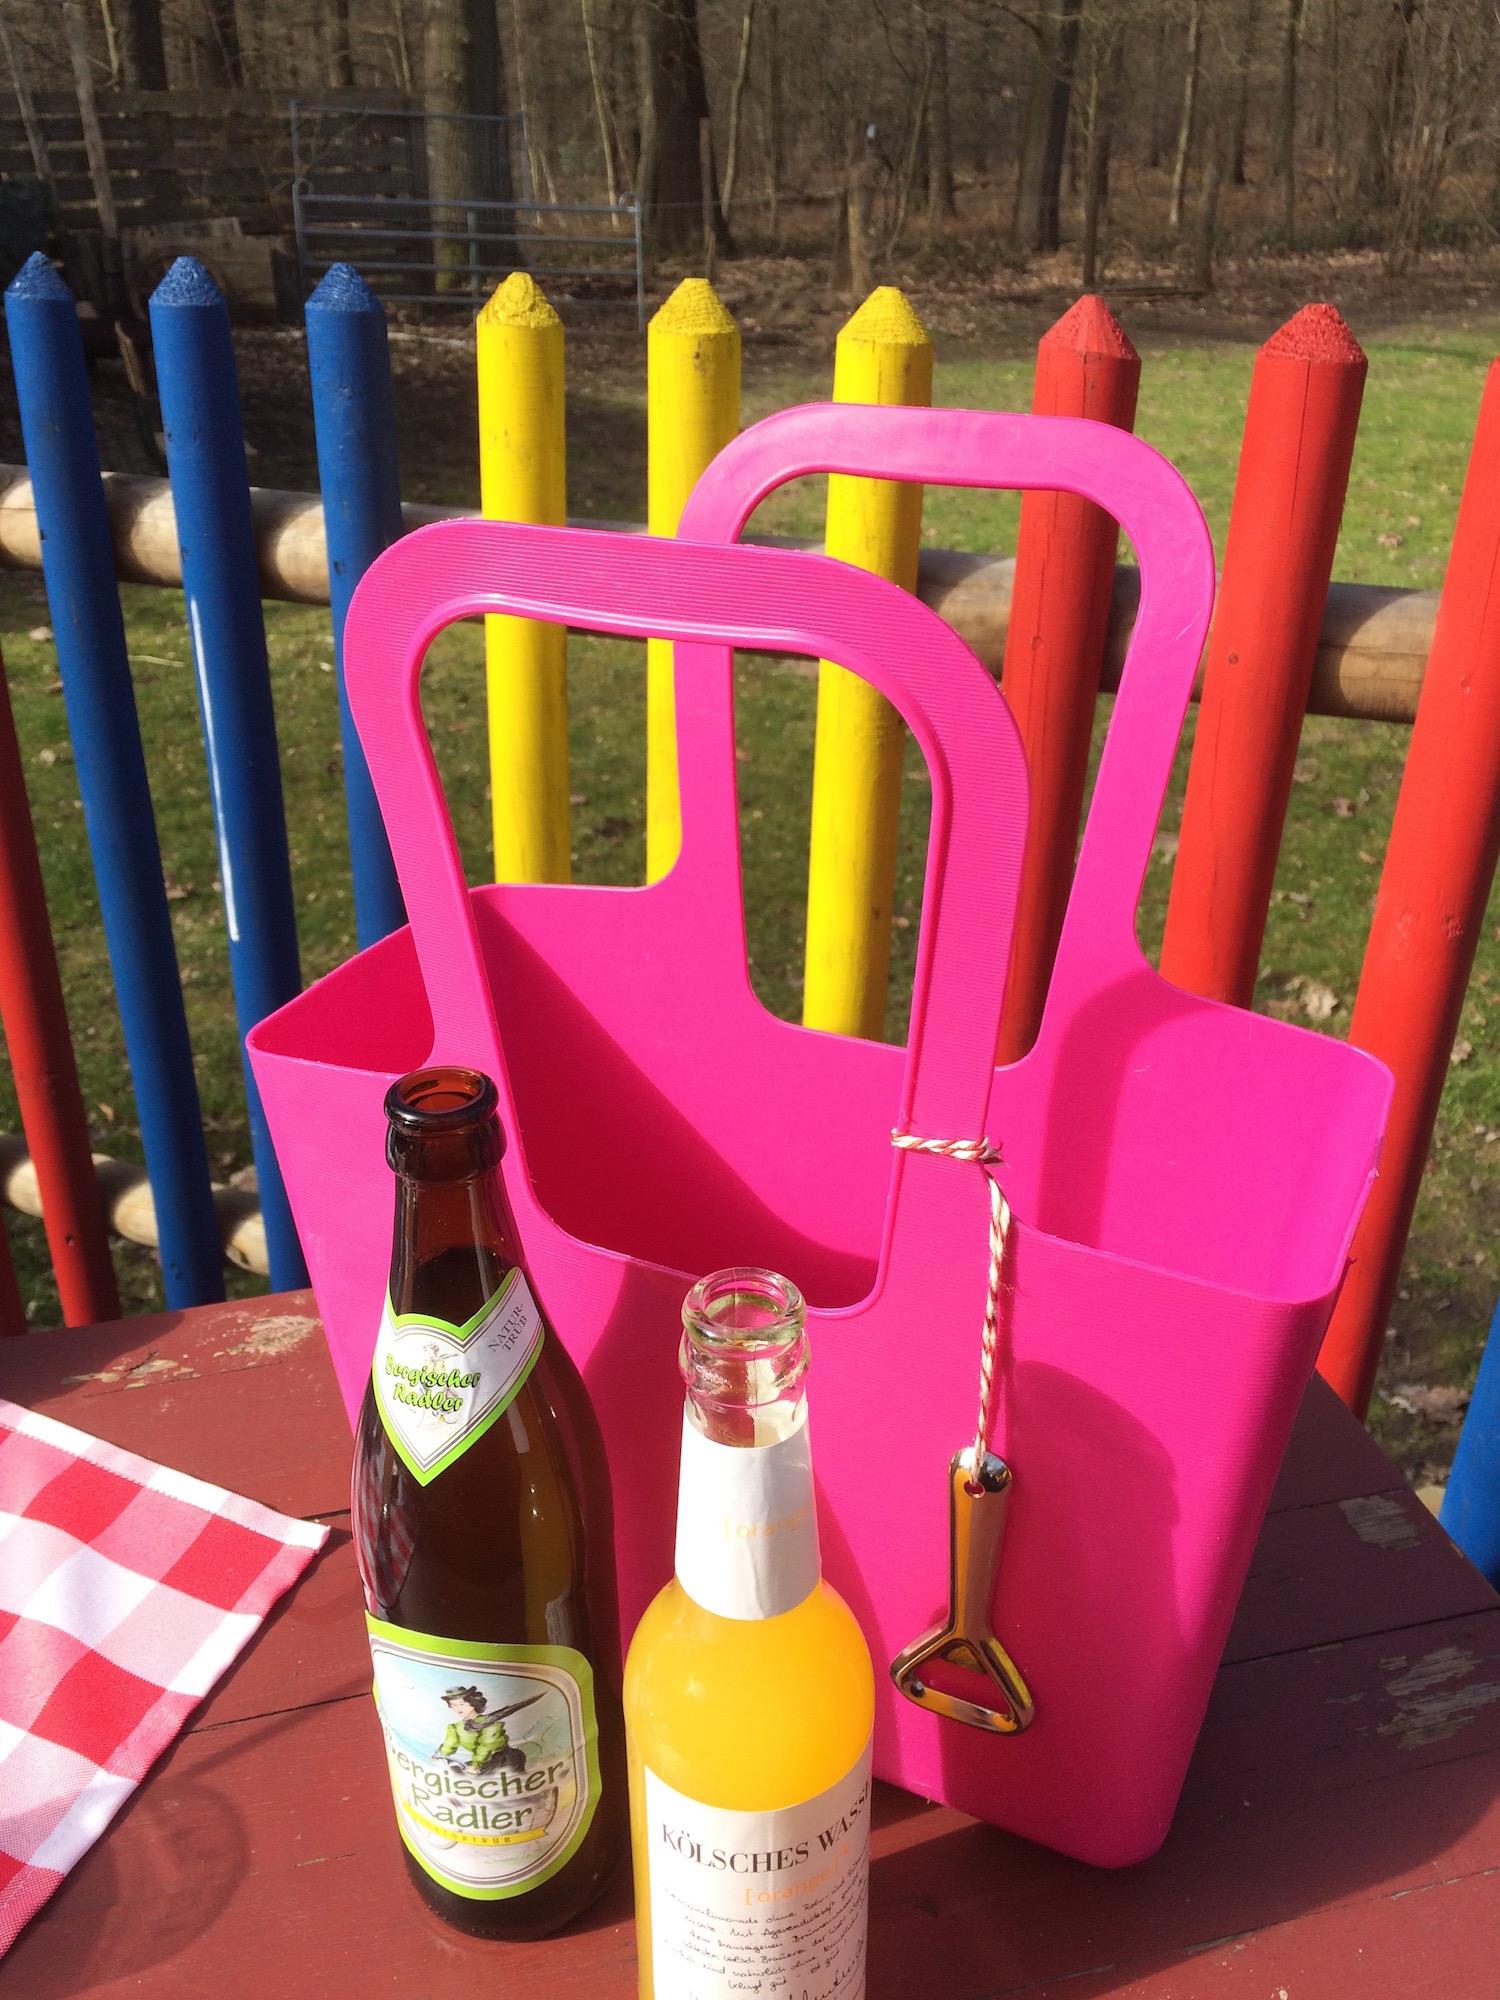 Selbstbedienung de Luxe - Getränke im Körbchen! - köln-fimmel